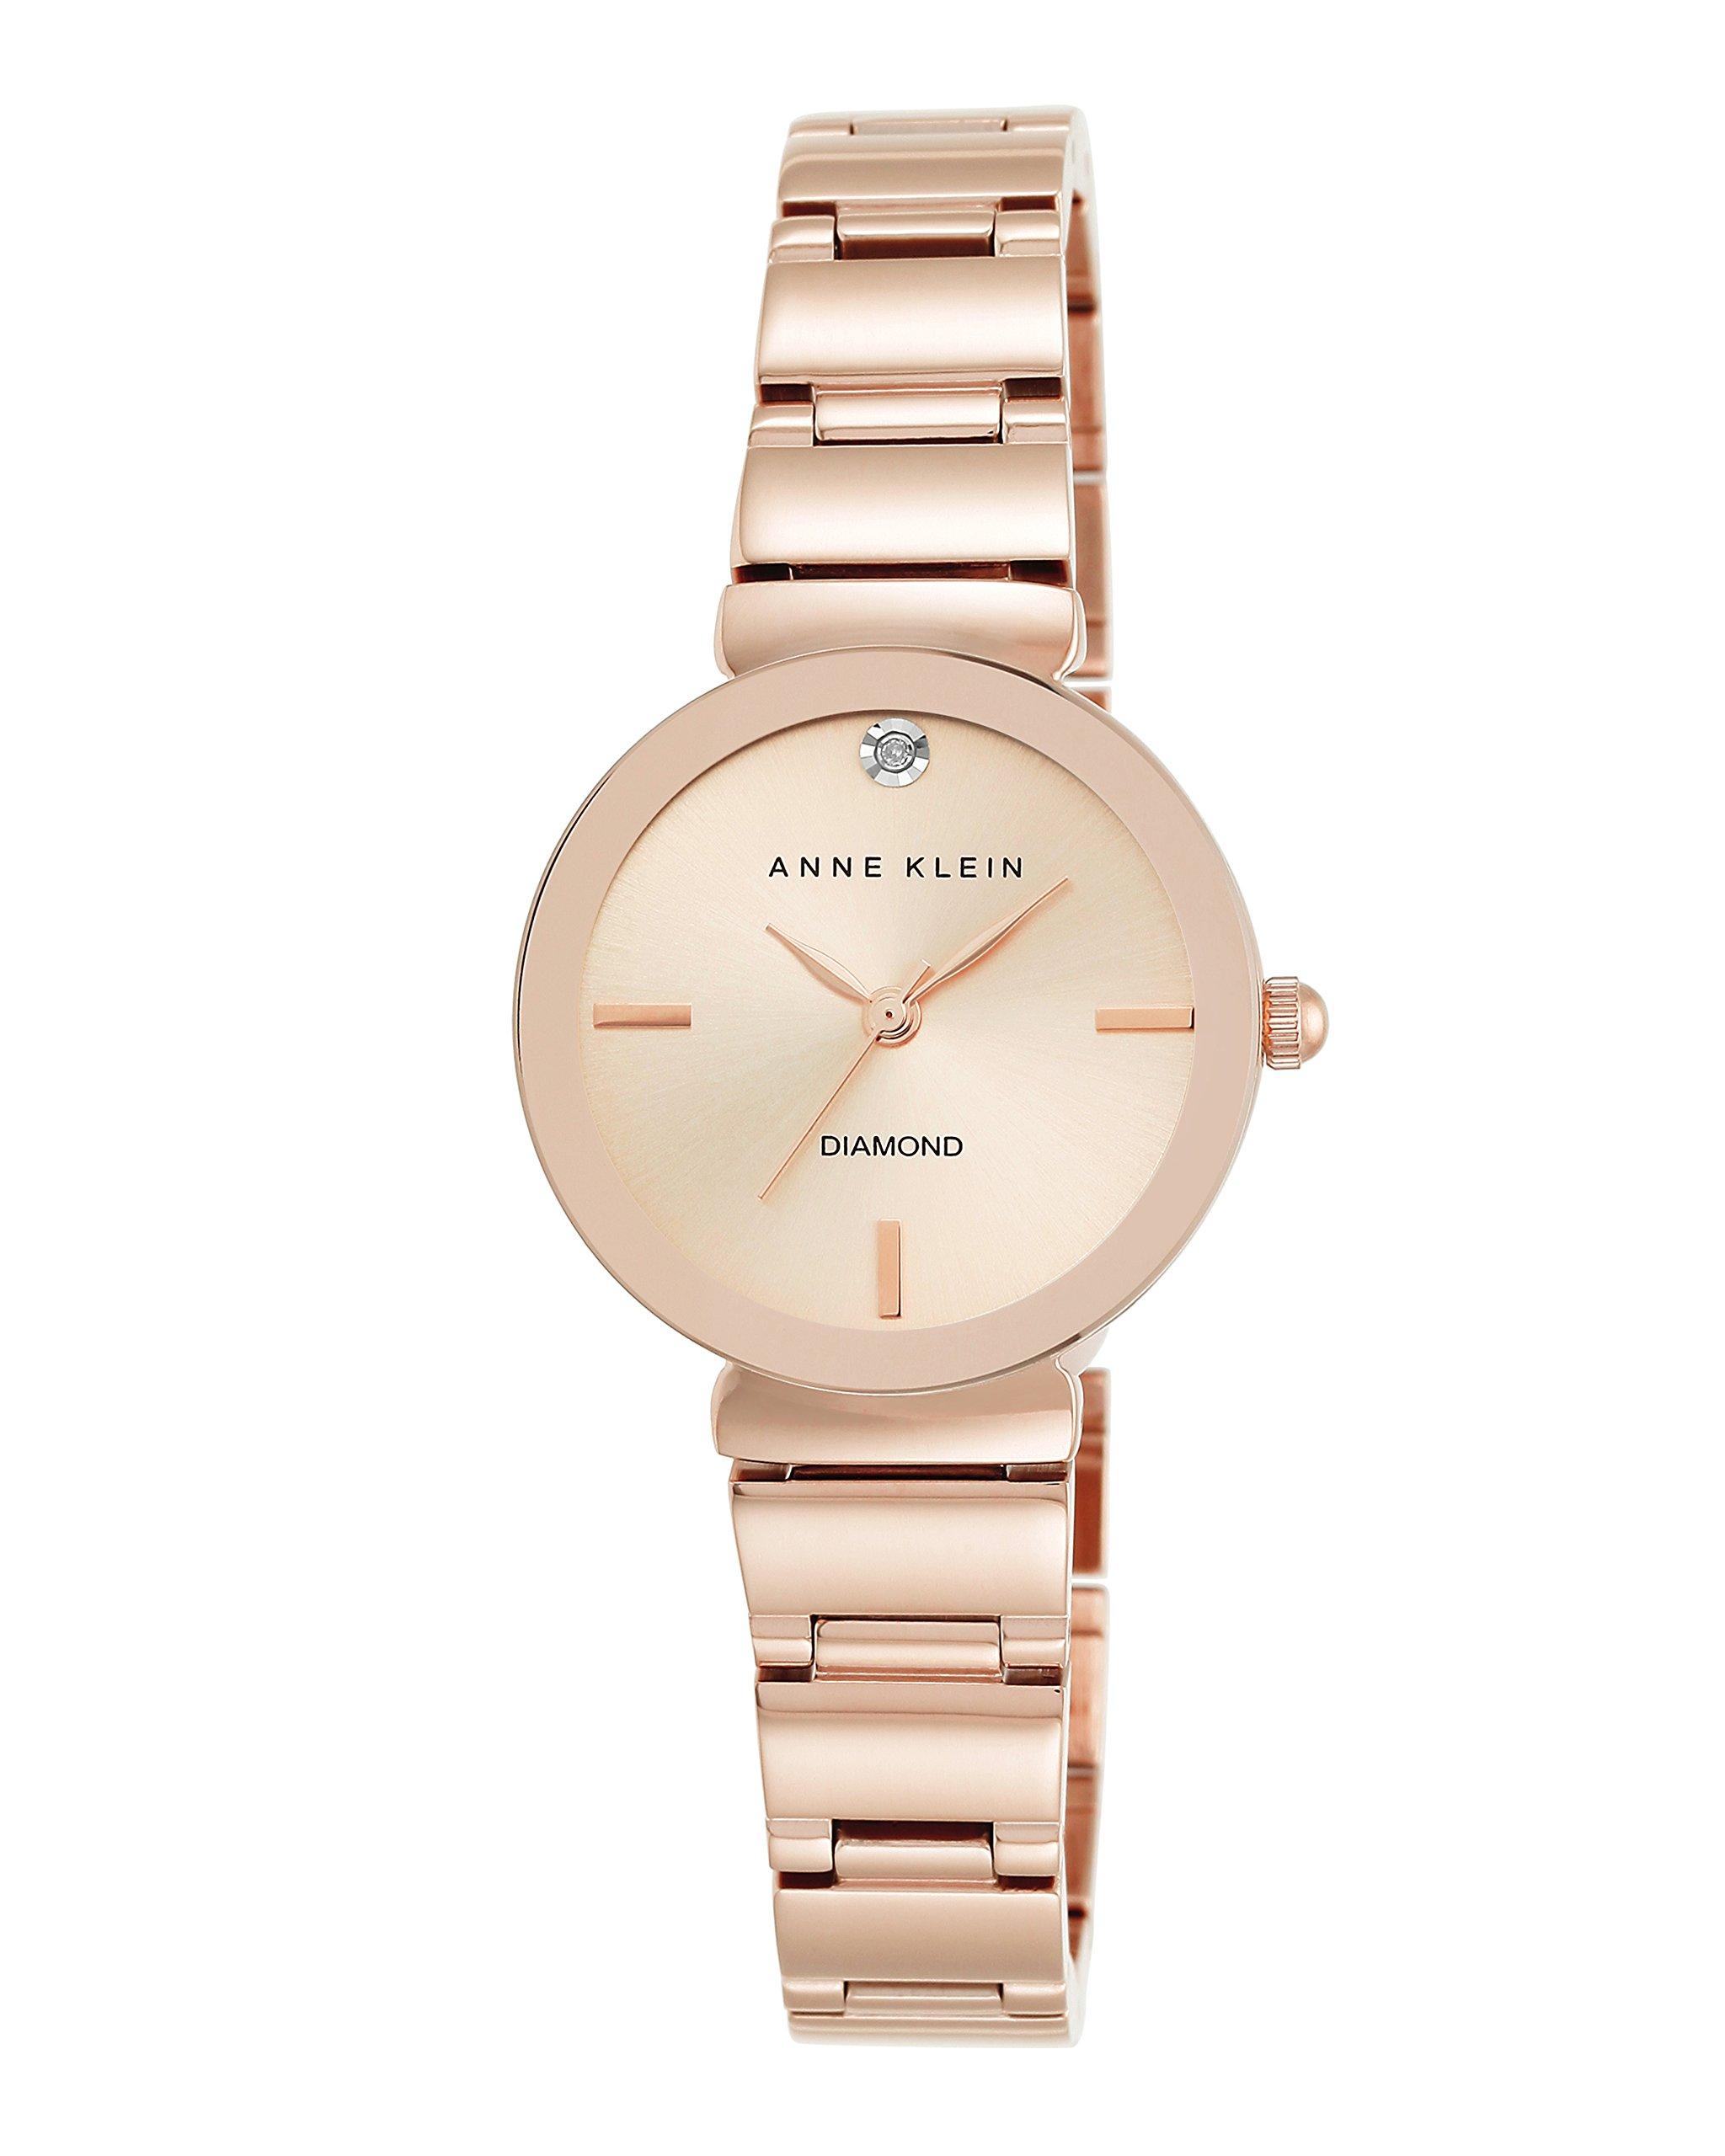 Anne Klein Women's AK/2434RGRG Diamond-Accented Rose Gold-Tone Bracelet Watch by Anne Klein